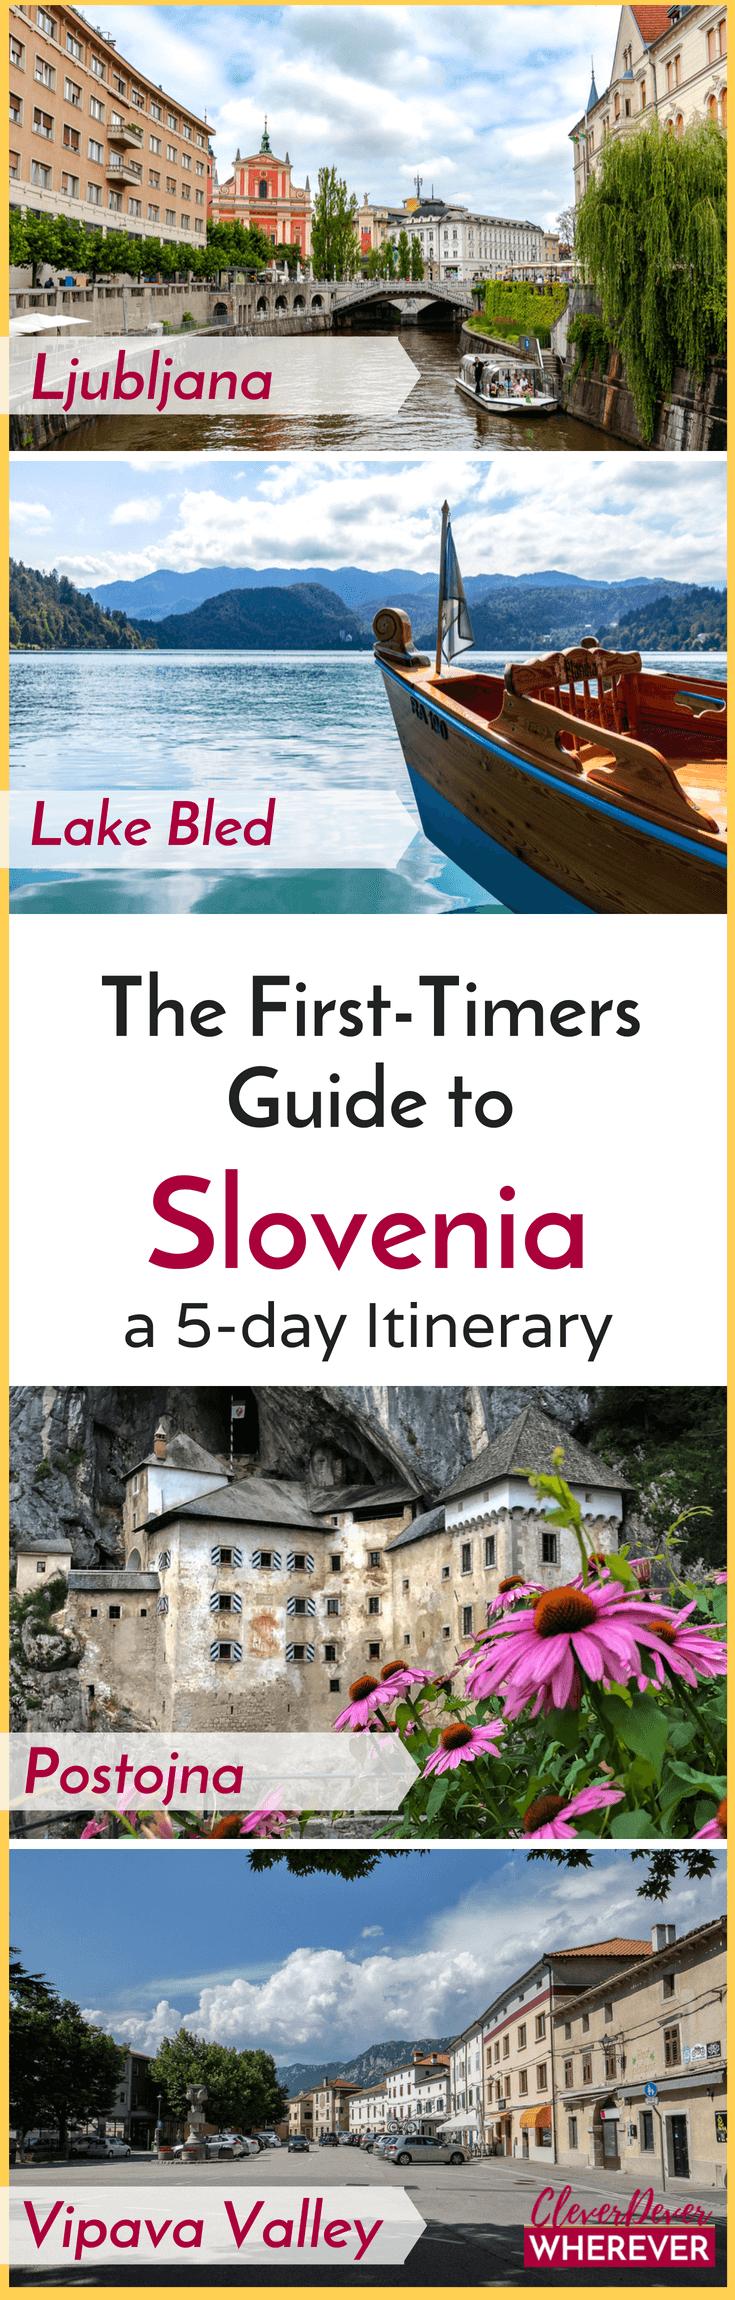 Plan a trip to Slovenia with this 5 day itinerary and restaurant guide #Slovenia #SloveniaTravel #Europe #EuropeTravel #LakeBled #Ljubljana #PostojnaCaves